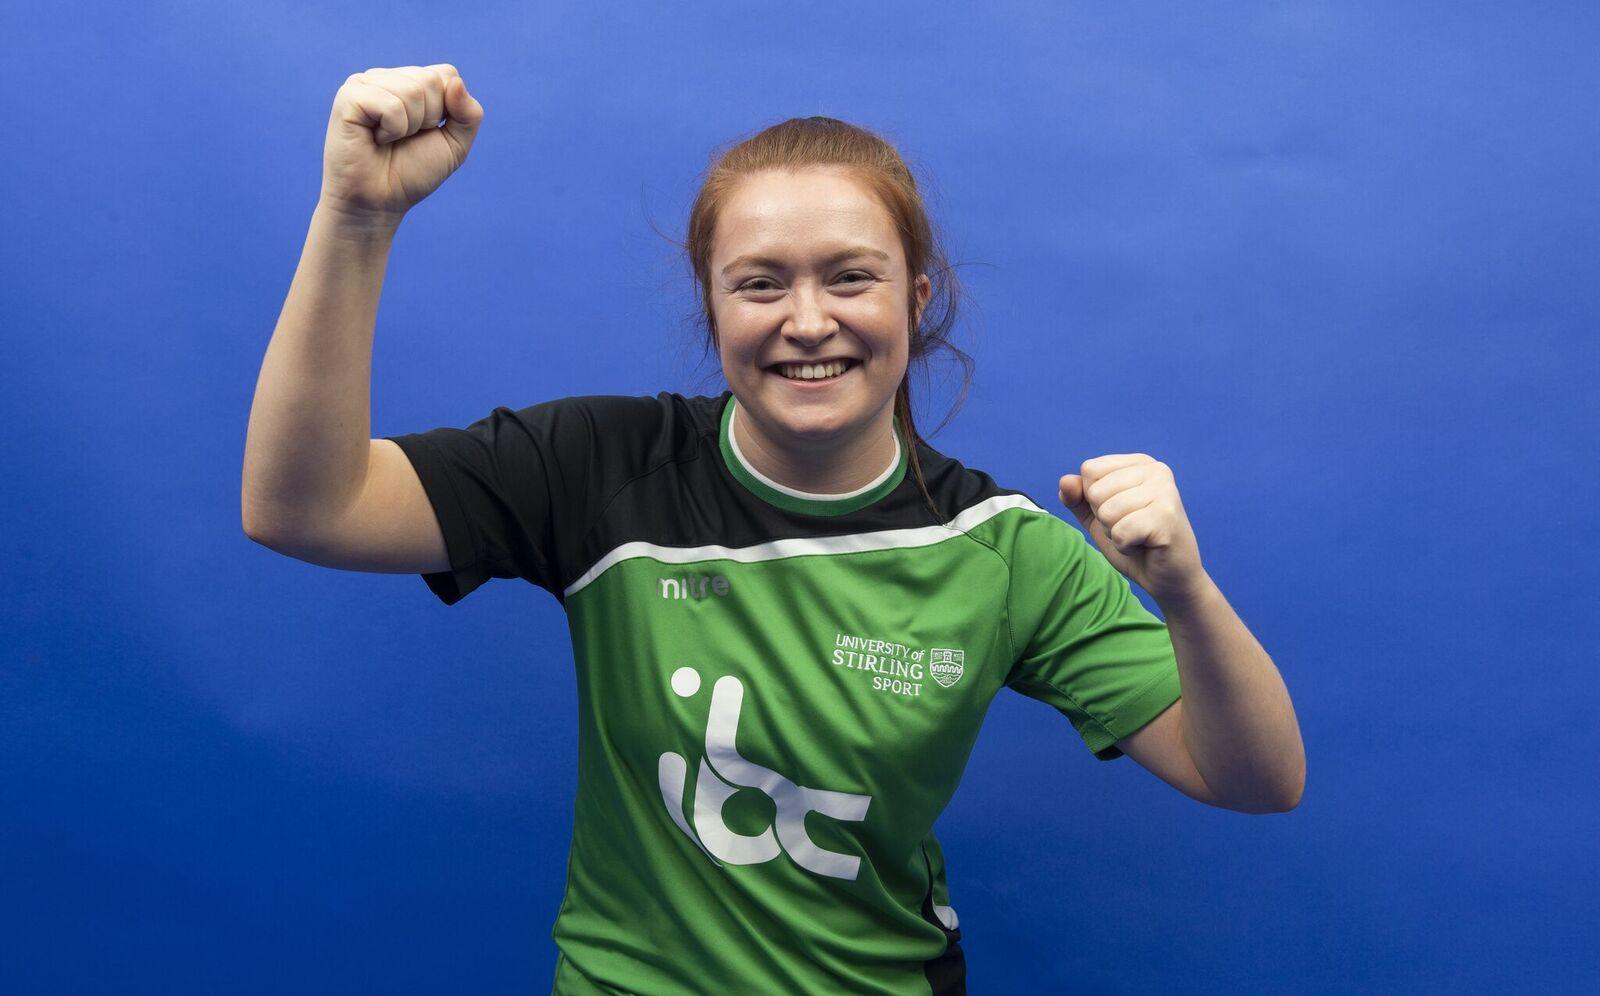 Ciara Bonner, Stirling University WFC